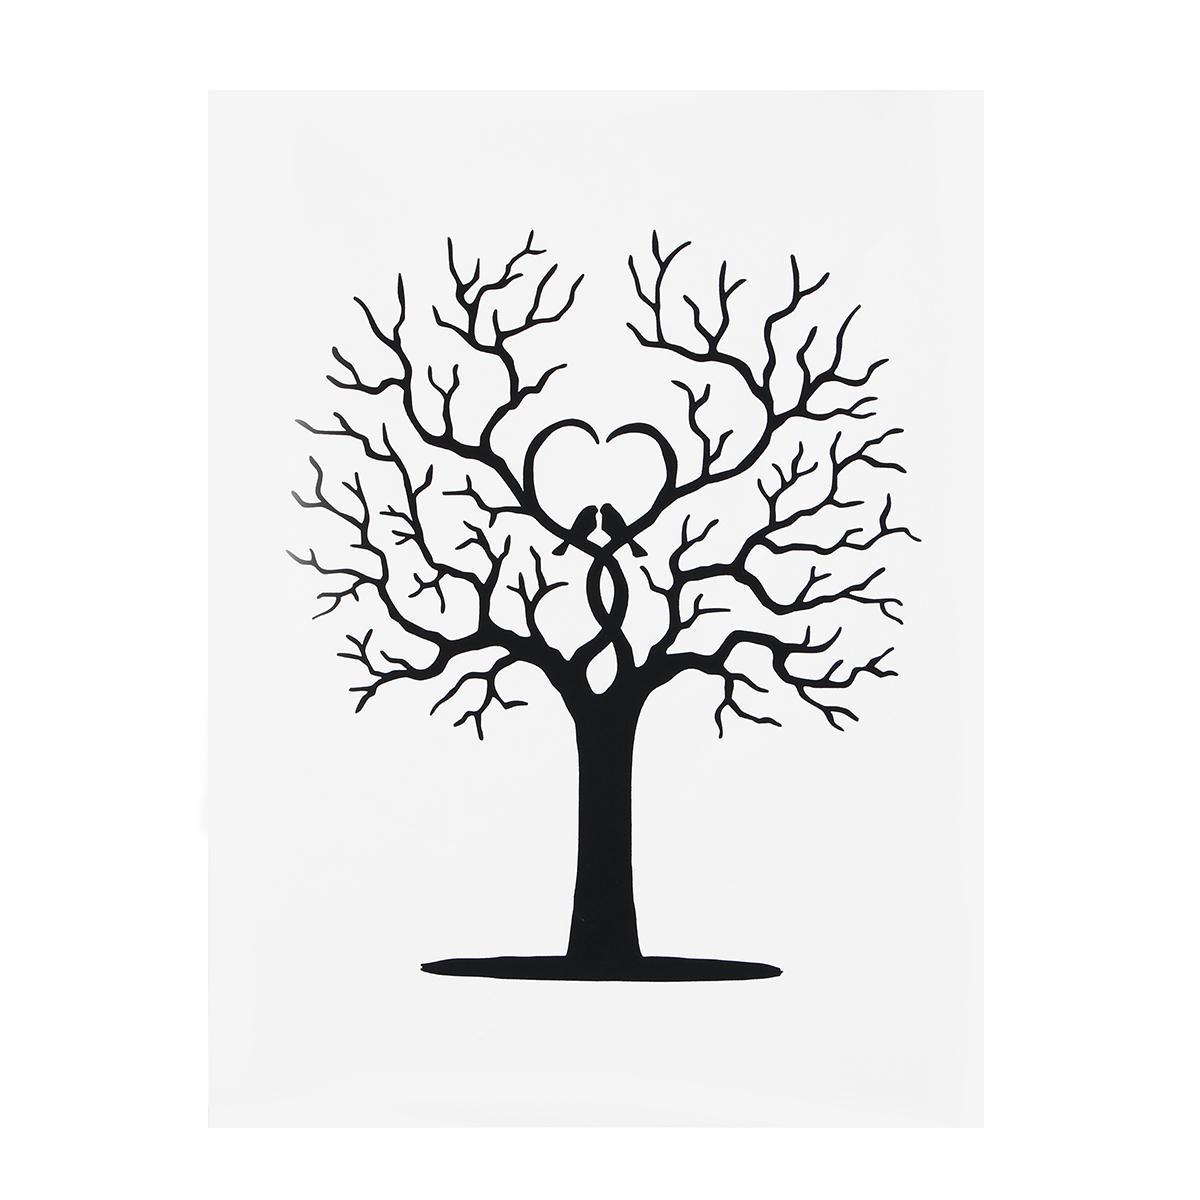 требуется шаблон для дерева пожеланий всего